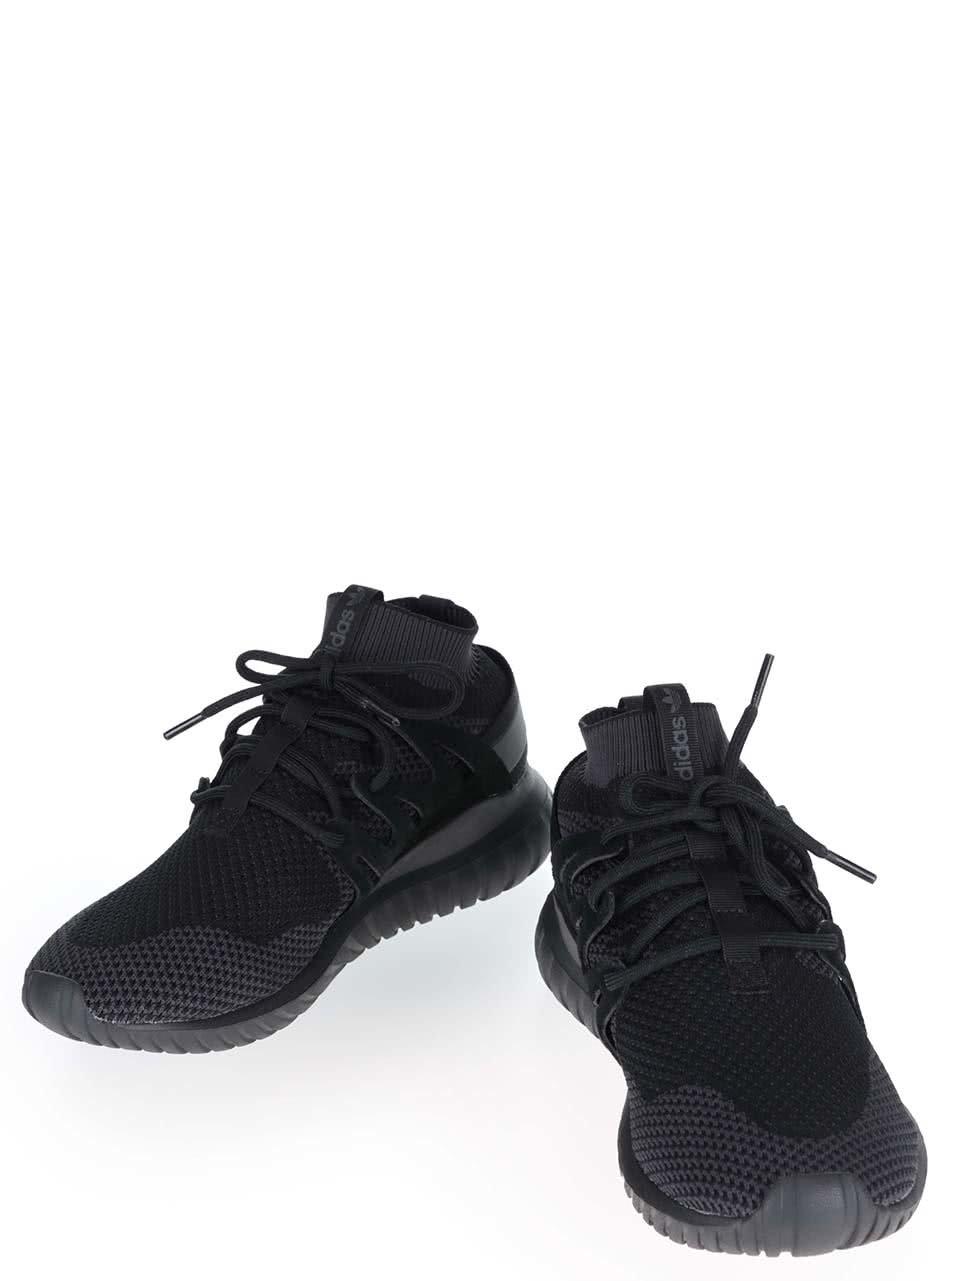 Čierne pánske tenisky adidas Originals Tubular Nova PK ... 5fd451c7d7a